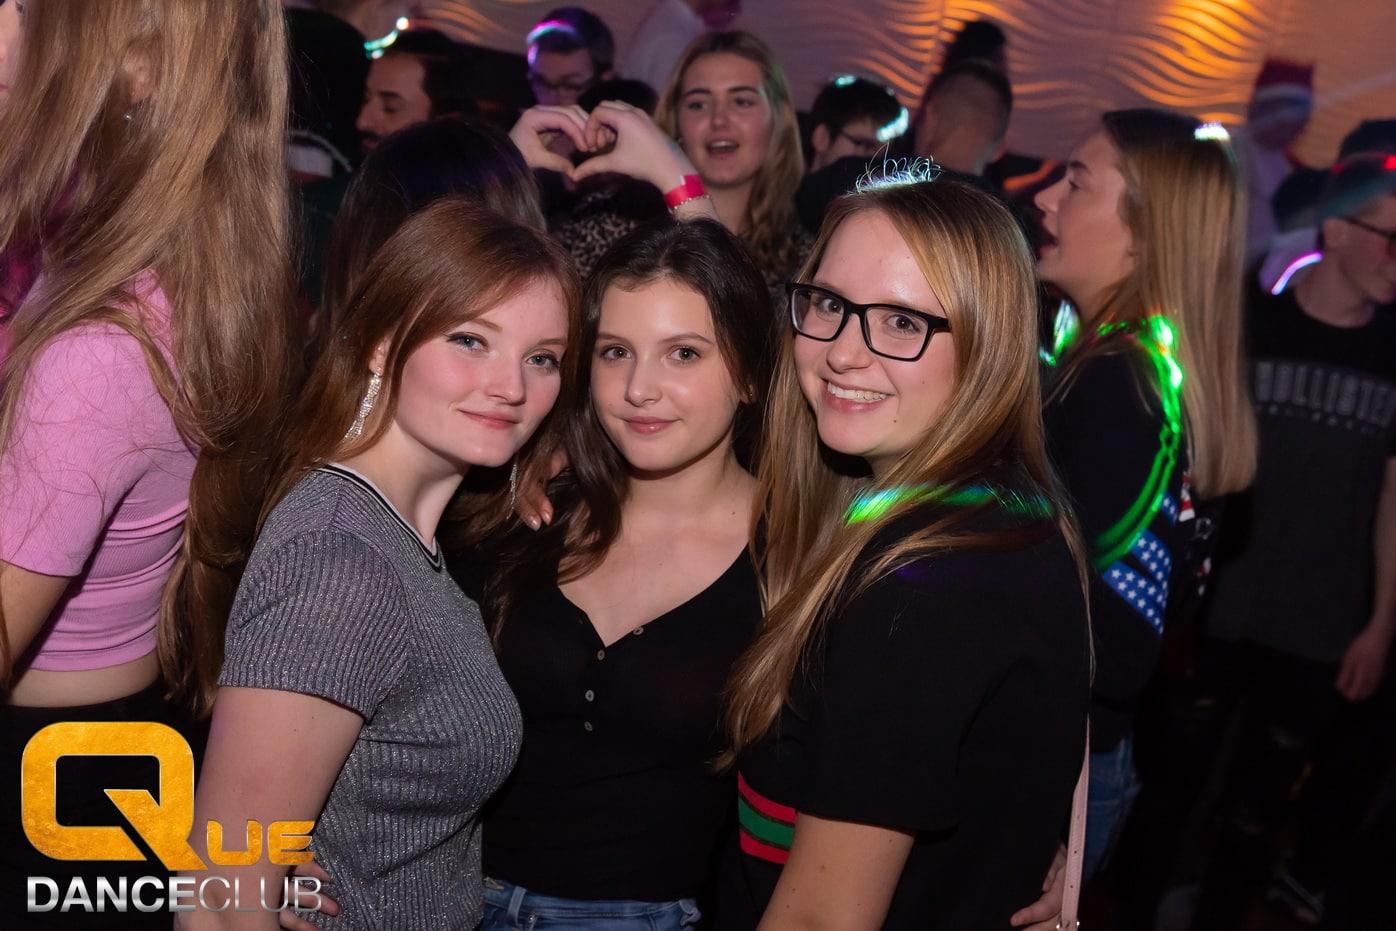 2018_12_20_Que_Danceclub_XMAS_Abiparty_United_Nightlife_Scene_Timo_029